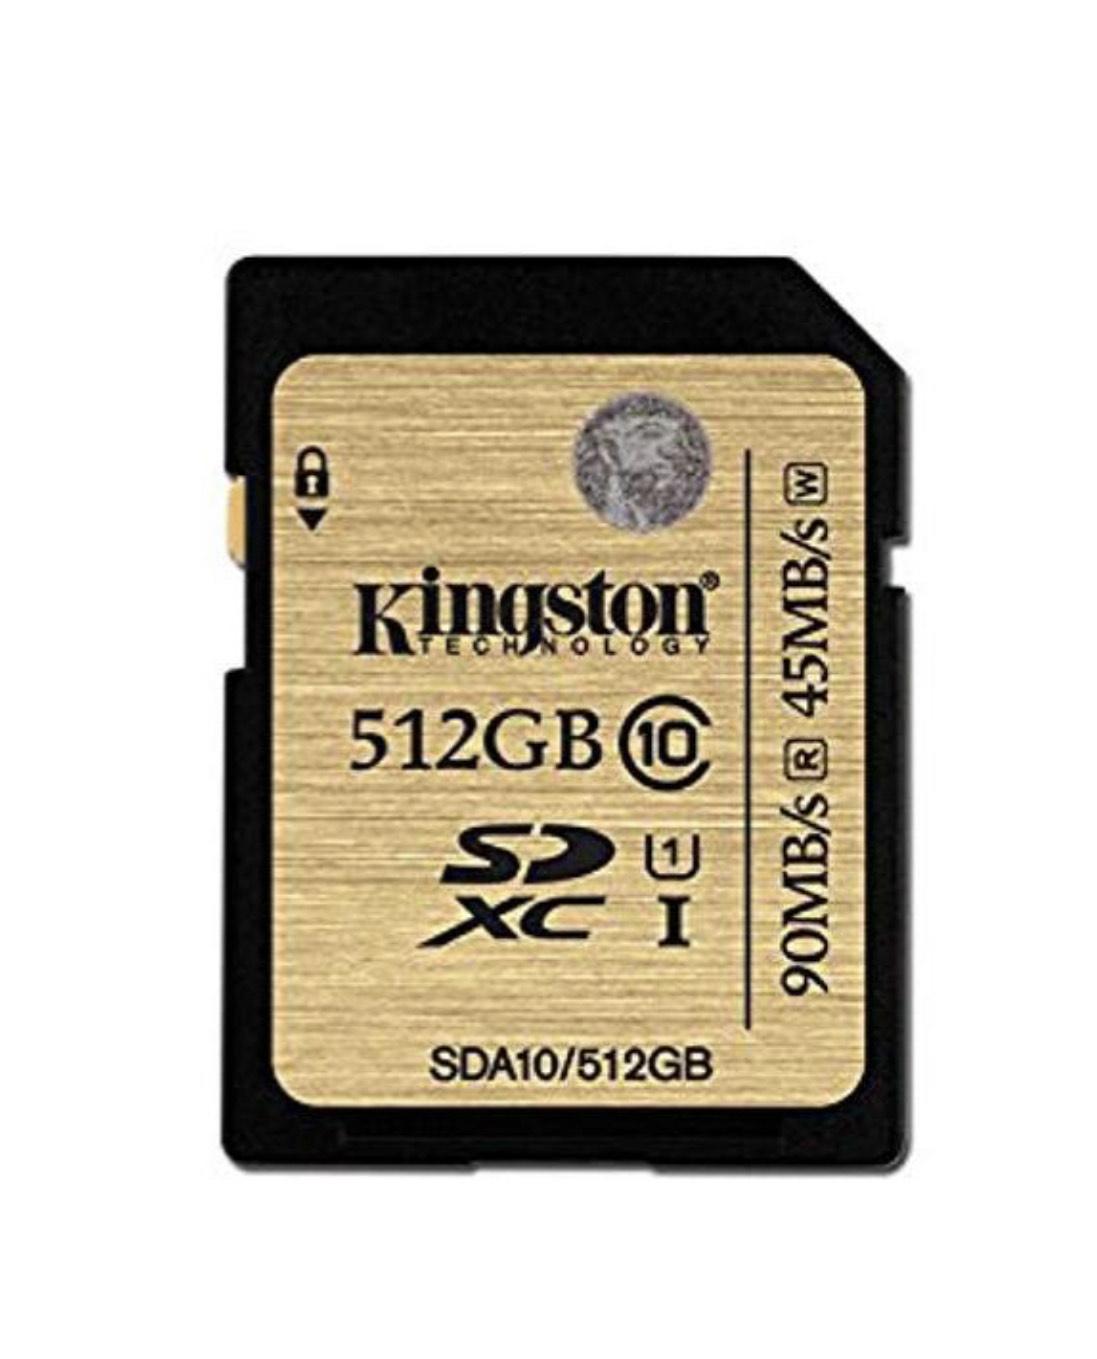 Kingston SDA10/512GB